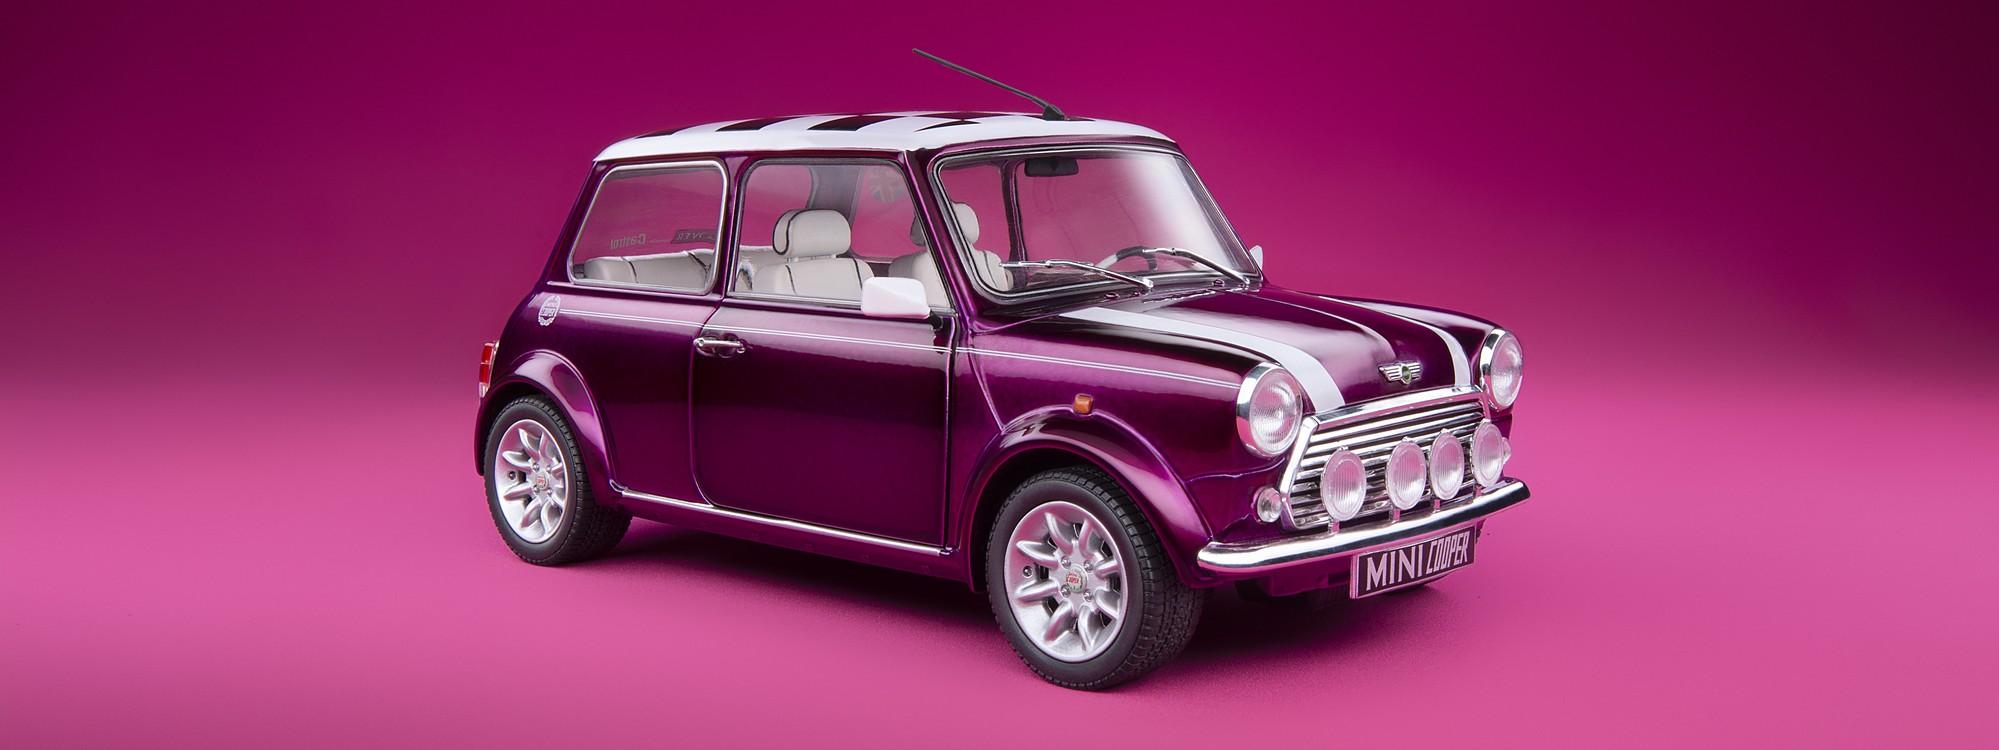 Slide - S1800606 - Mini cooper sport purple